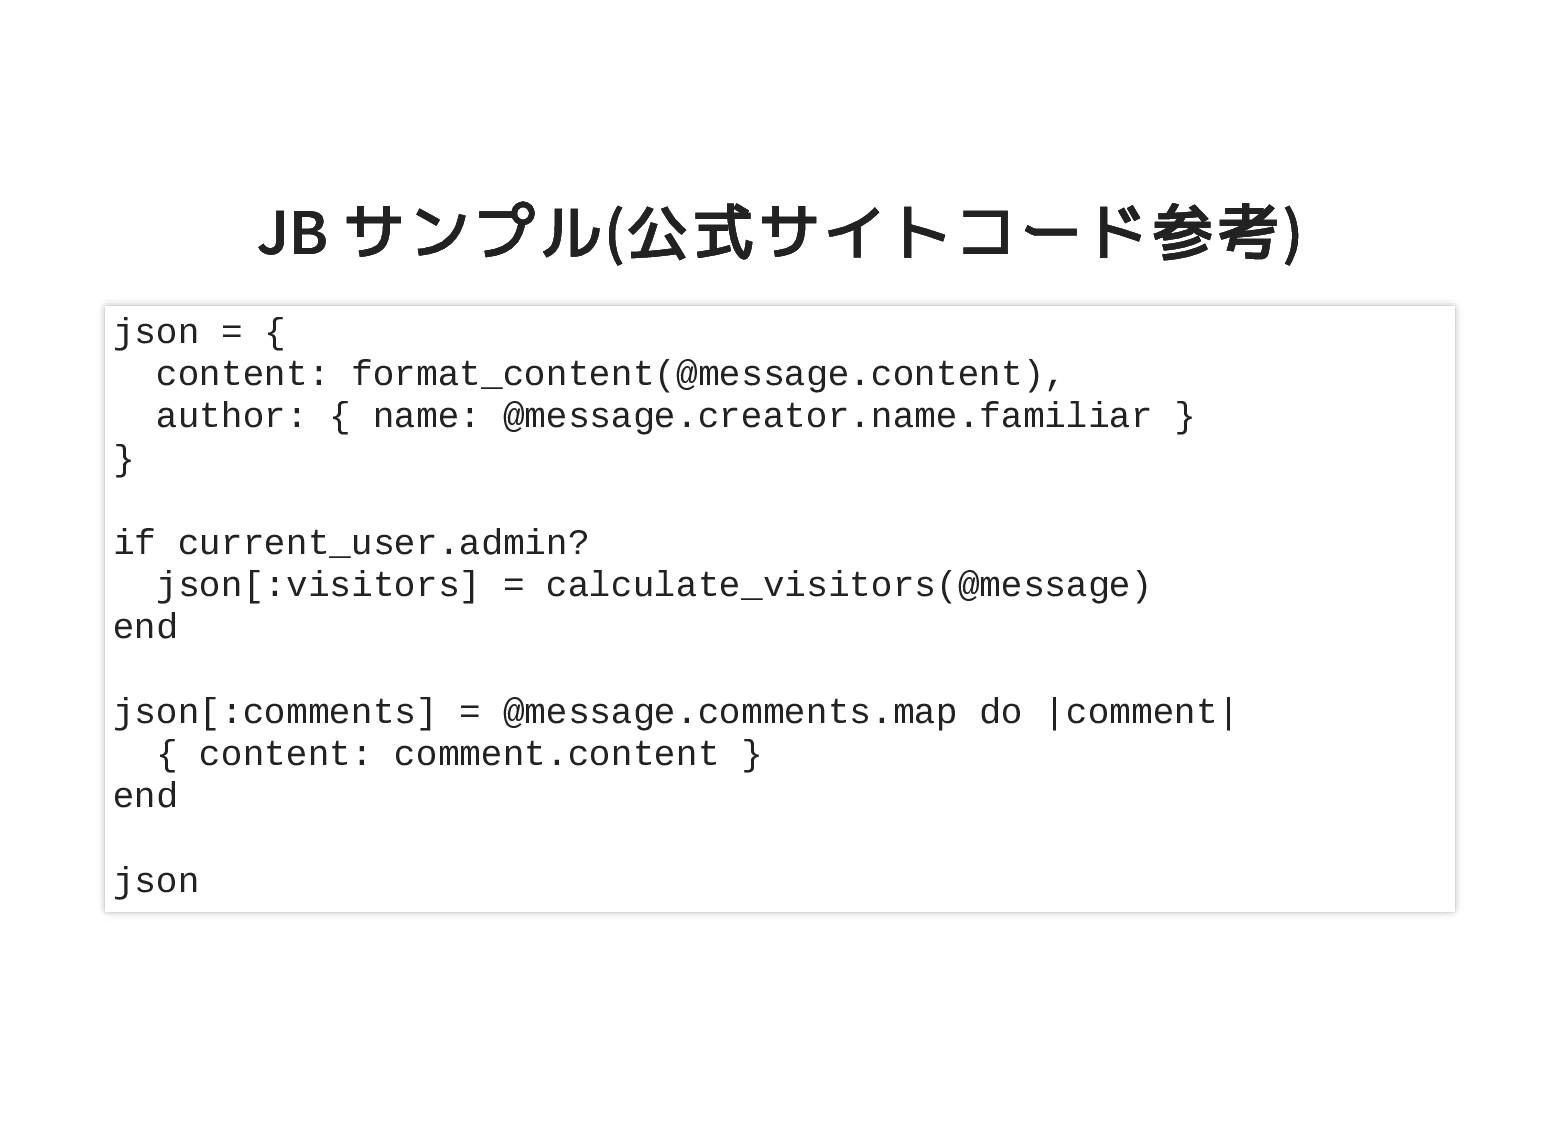 JB サンプル(公式サイトコード参考) JB サンプル(公式サイトコード参考) json = ...